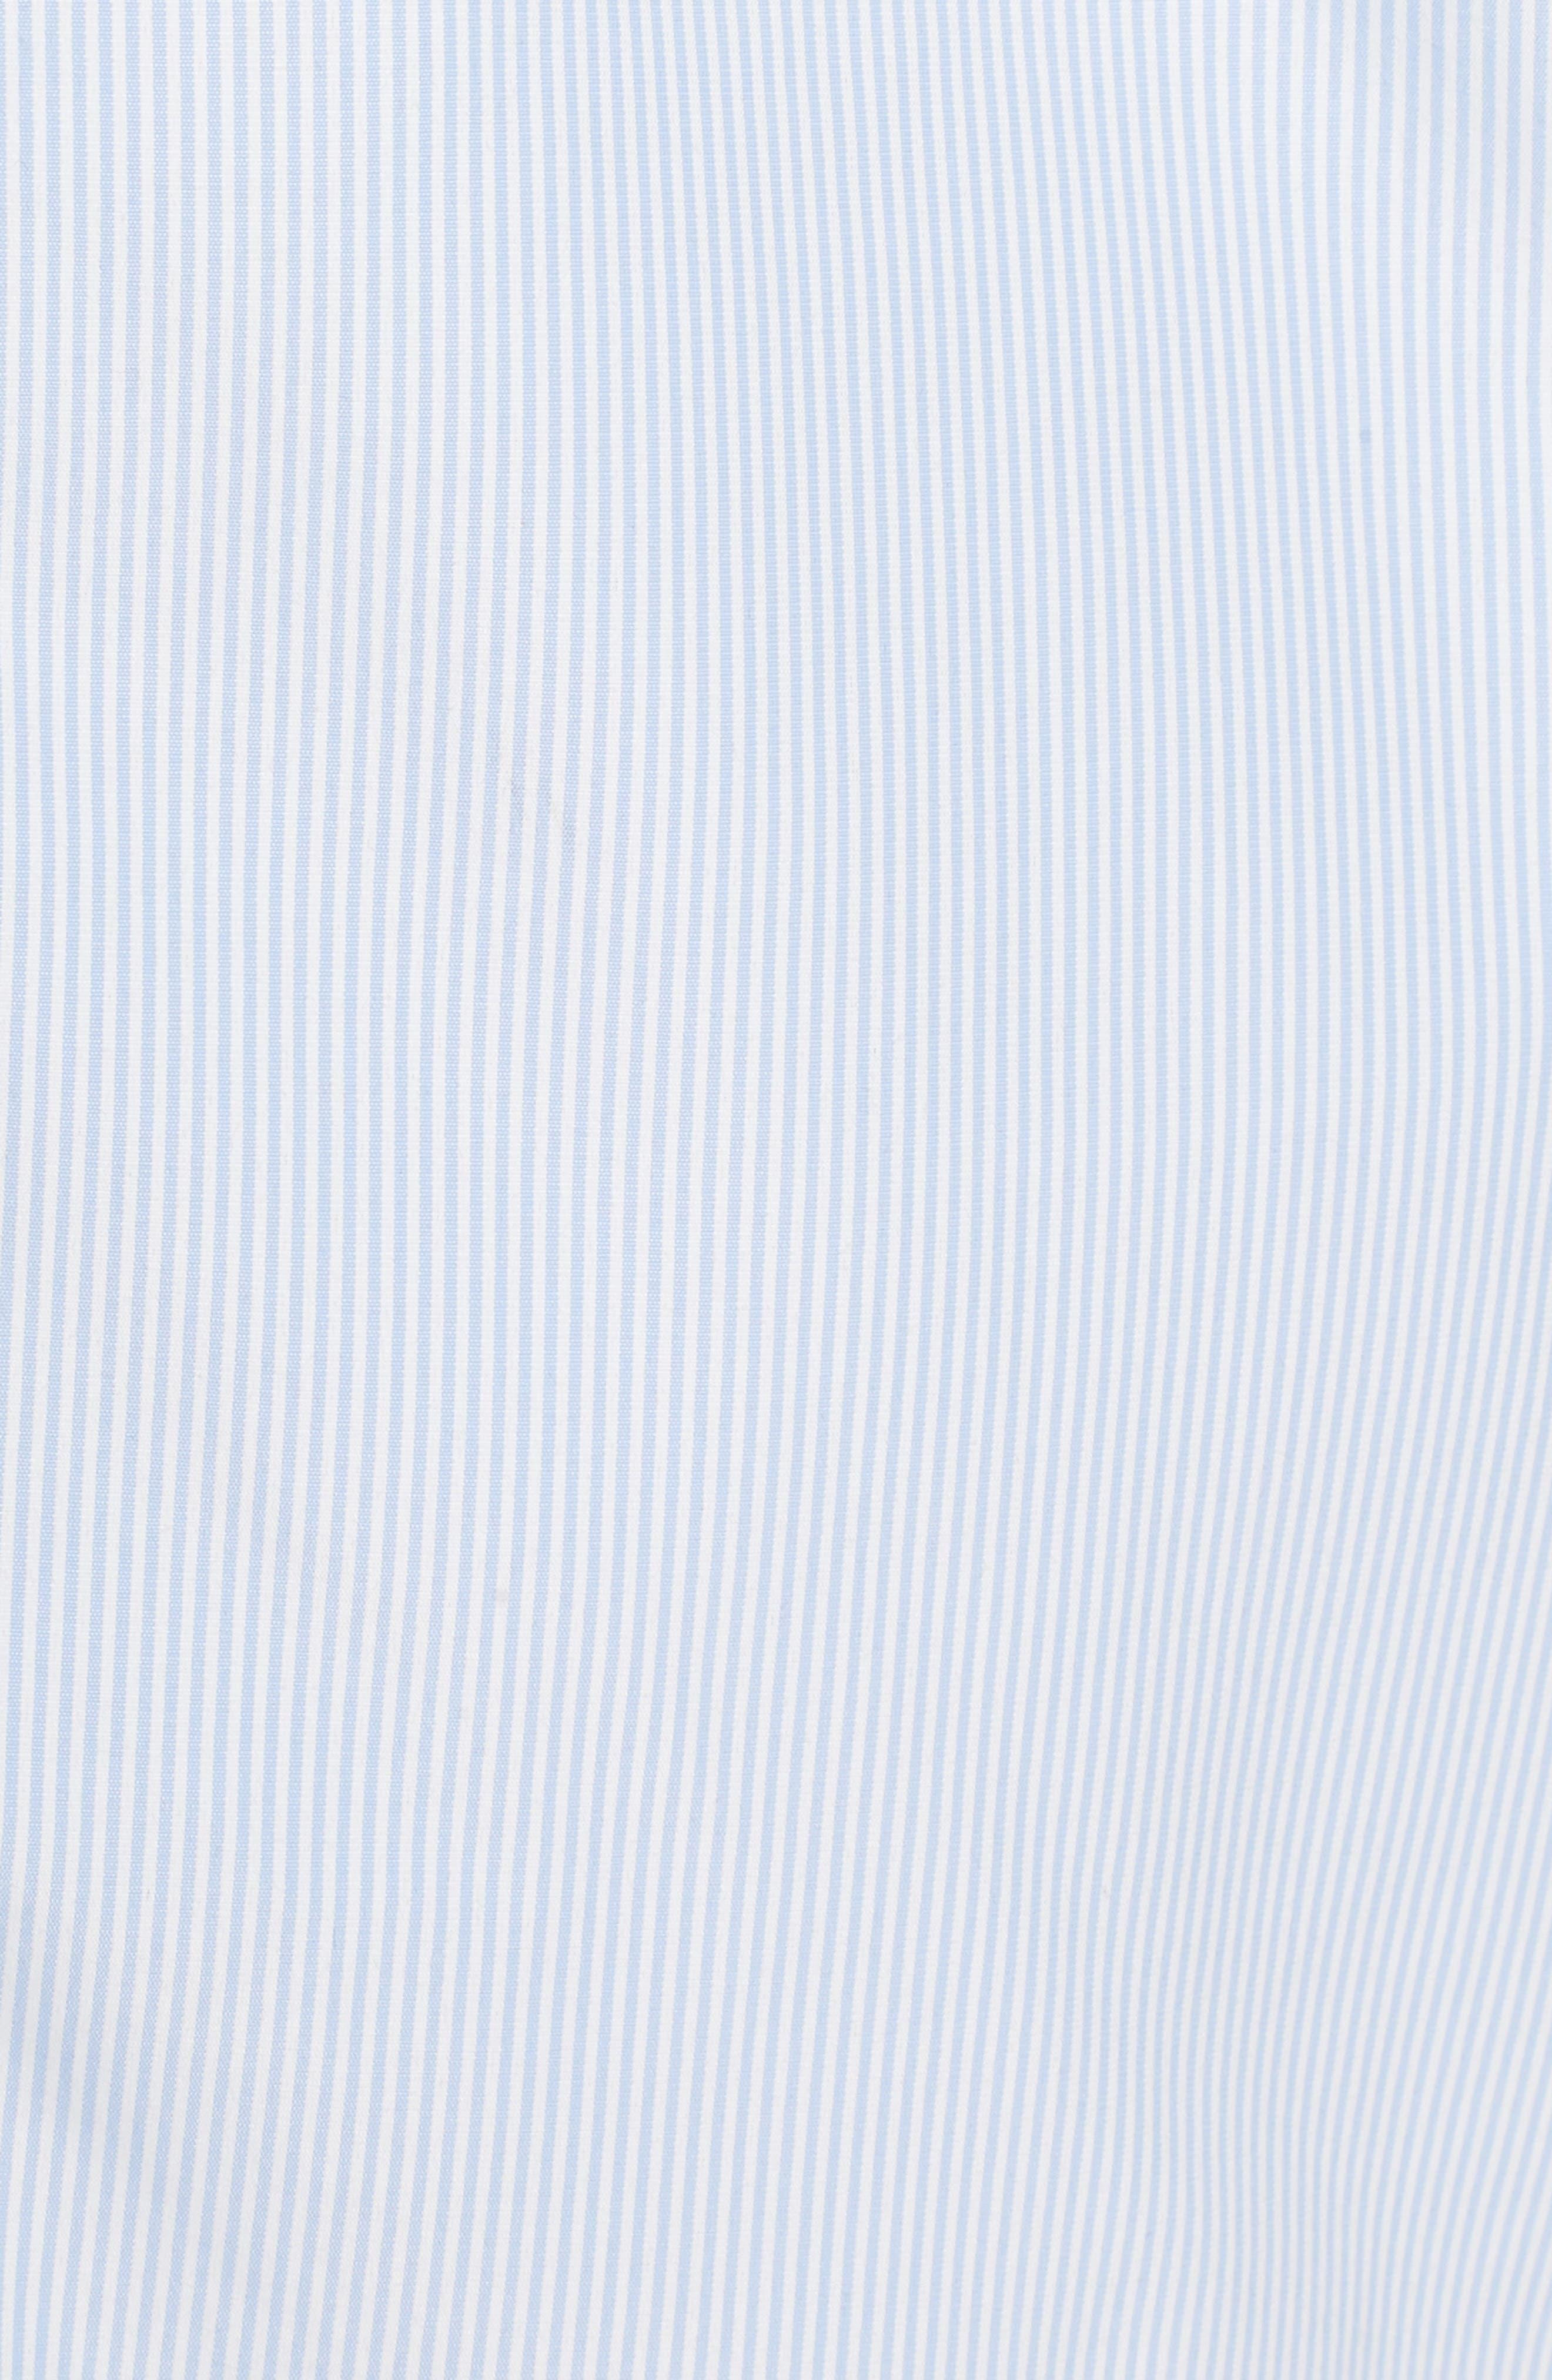 Smocked Off the Shoulder Dress,                             Alternate thumbnail 3, color,                             Bright White / Serenity